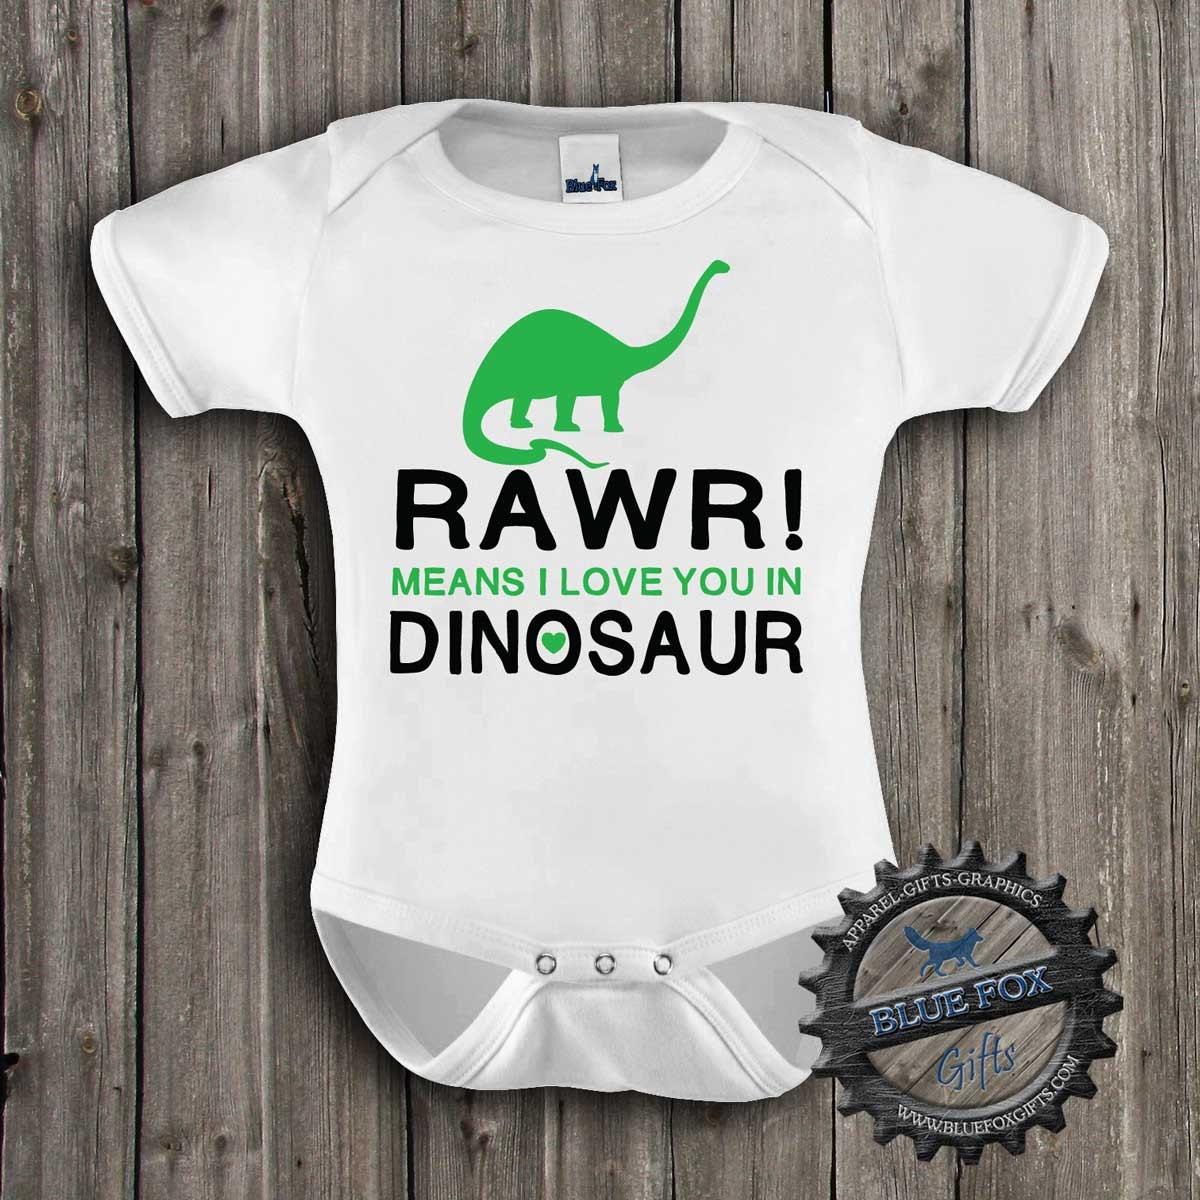 Dinosaur Baby Shirt-Rawr means I love you in Dinosaur-Cute